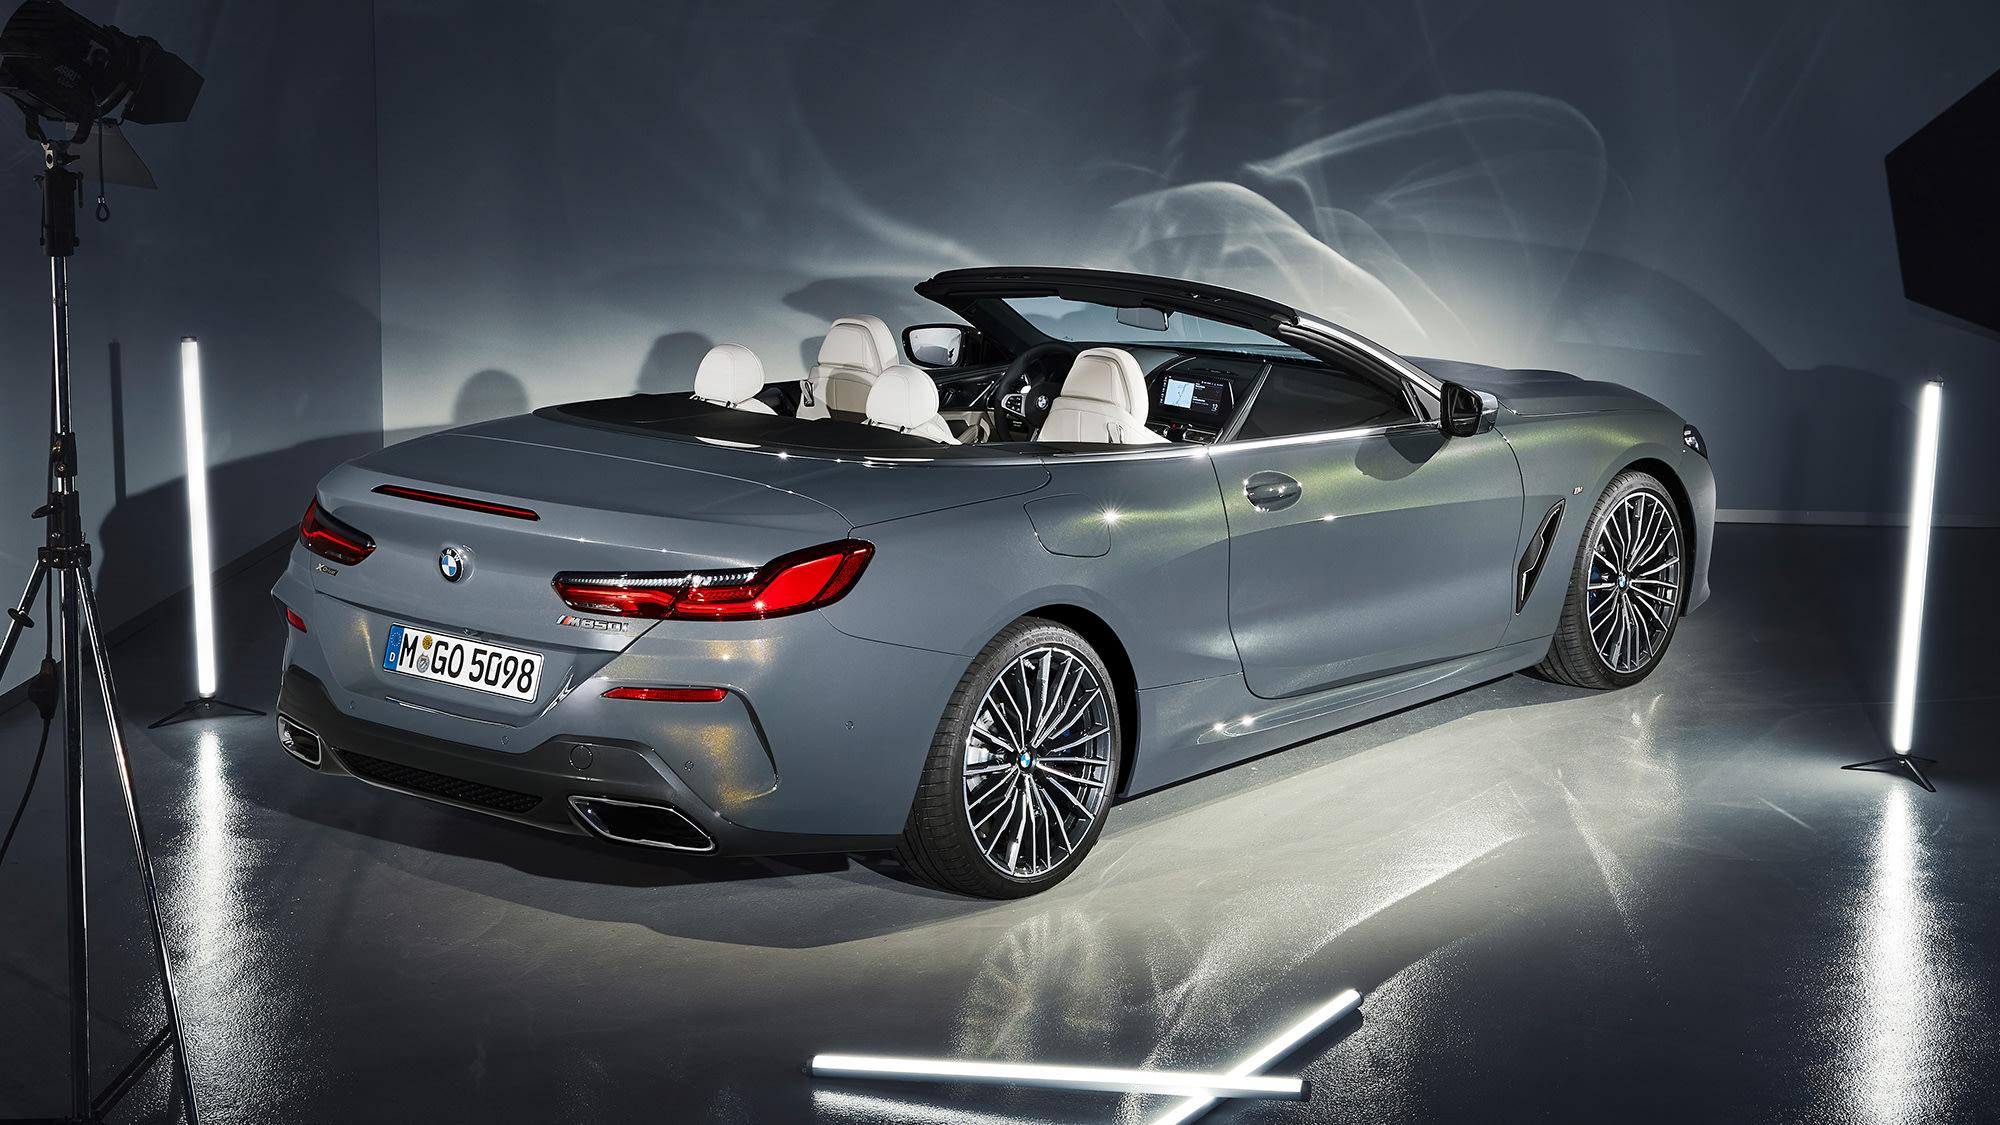 2019 BMW 8 Series Convertible P90328262 highRes